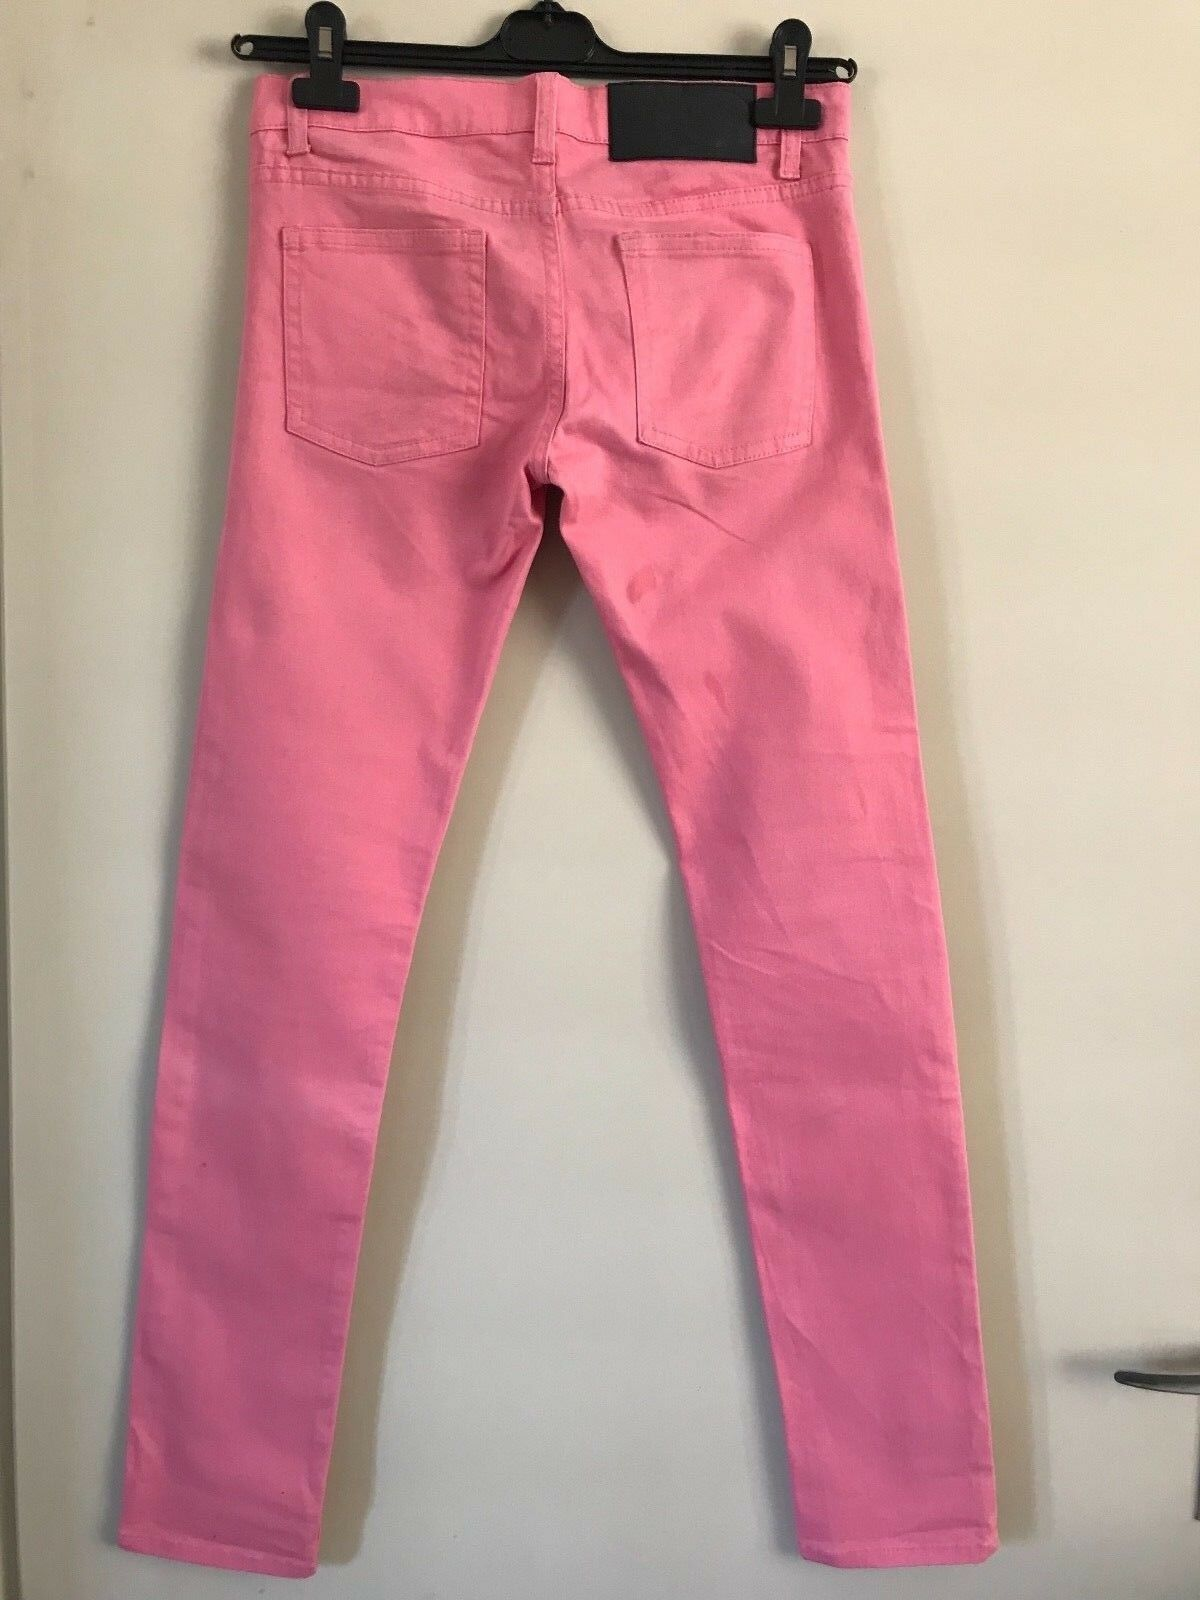 PANTALONE INDIE SKATE rosa rosa CHEAP MONDAY TAGLIA 29 29 29 32 STREET WEAR VAPORWAVE ef4d8b